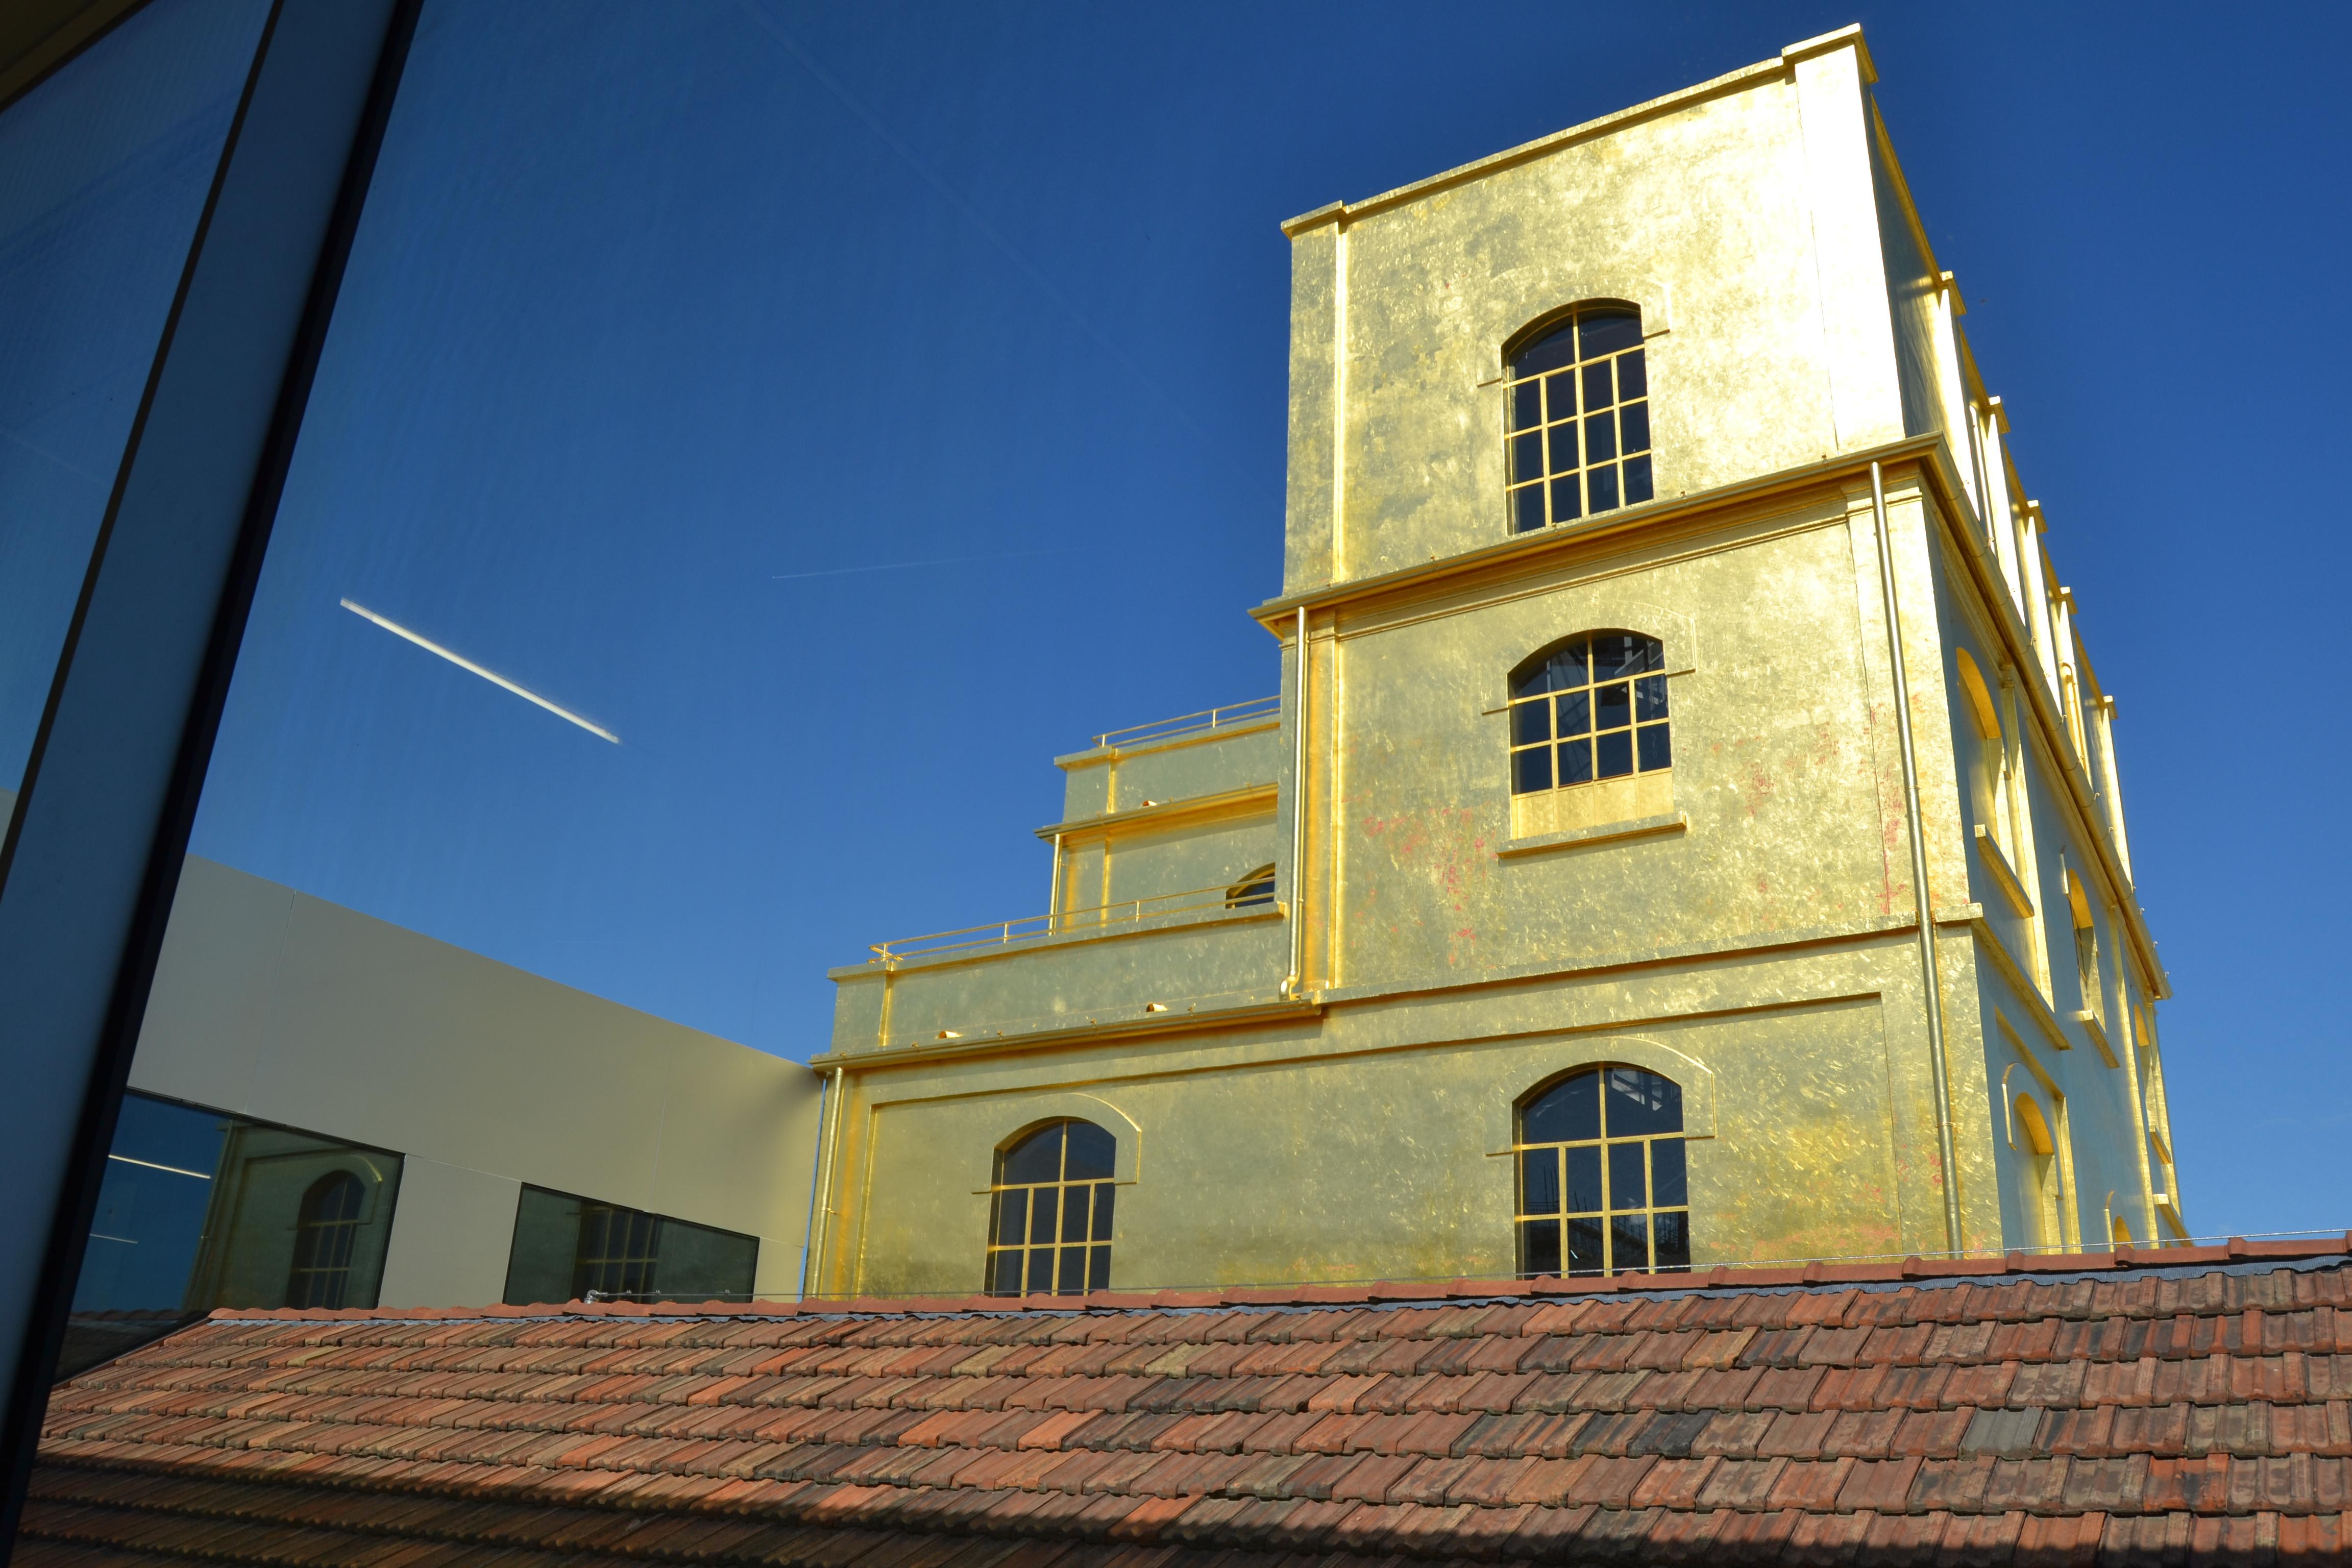 Fondazione Prada- Haunted House.